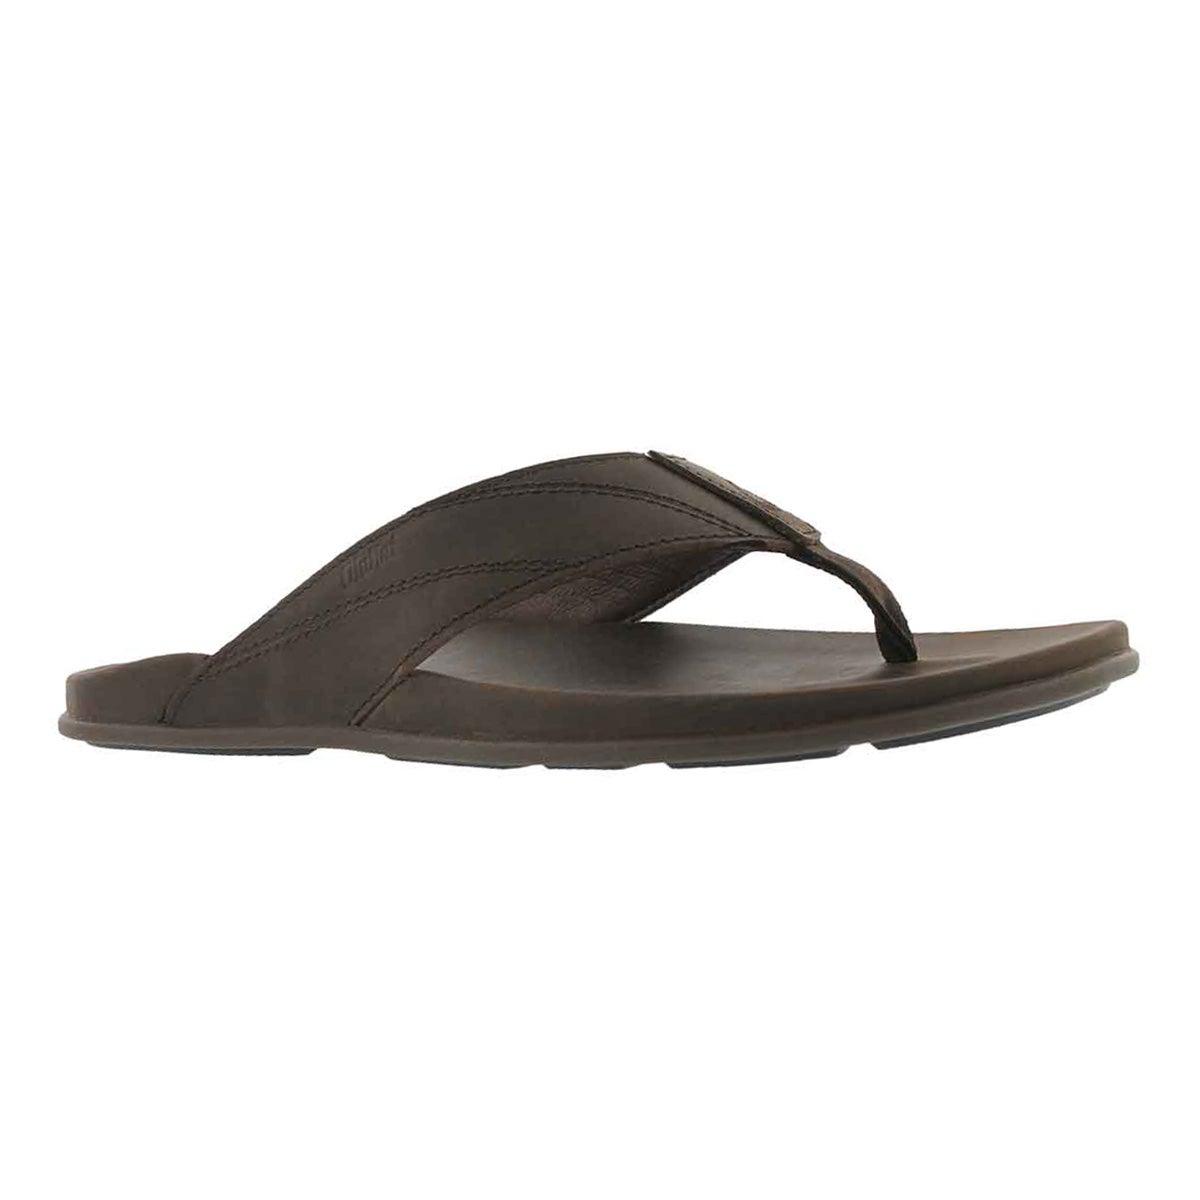 Men's PIKOI dark wood thong sandals